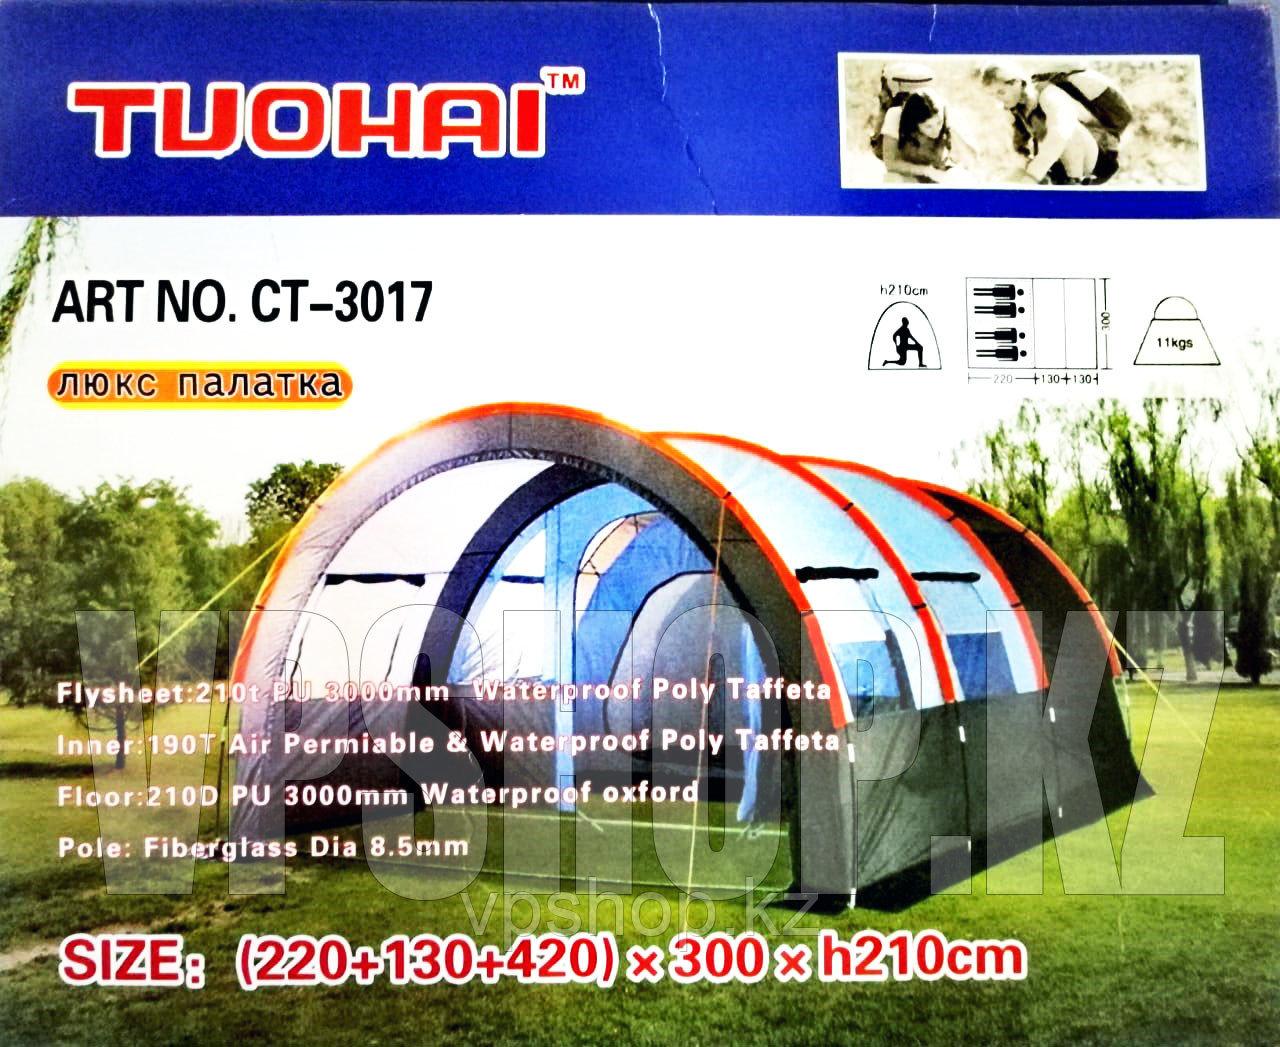 Палатка четырехместная люкс с коридором и шатром TUOHAI СТ-3017 (220+130+420)*300* h210)